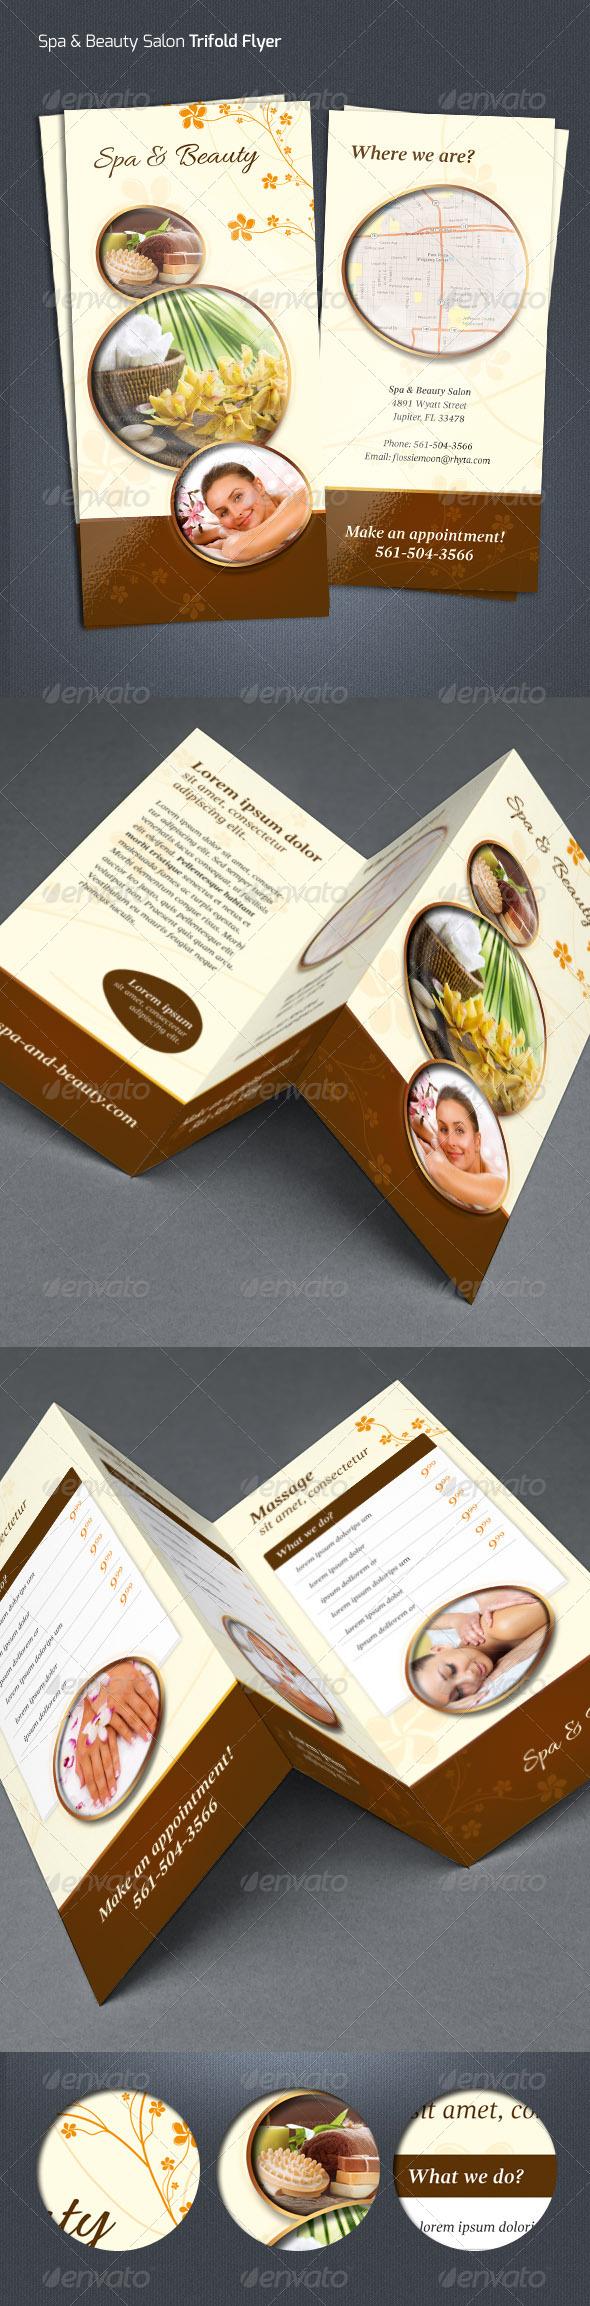 GraphicRiver Spa & Beauty Salon Flyer 7261765